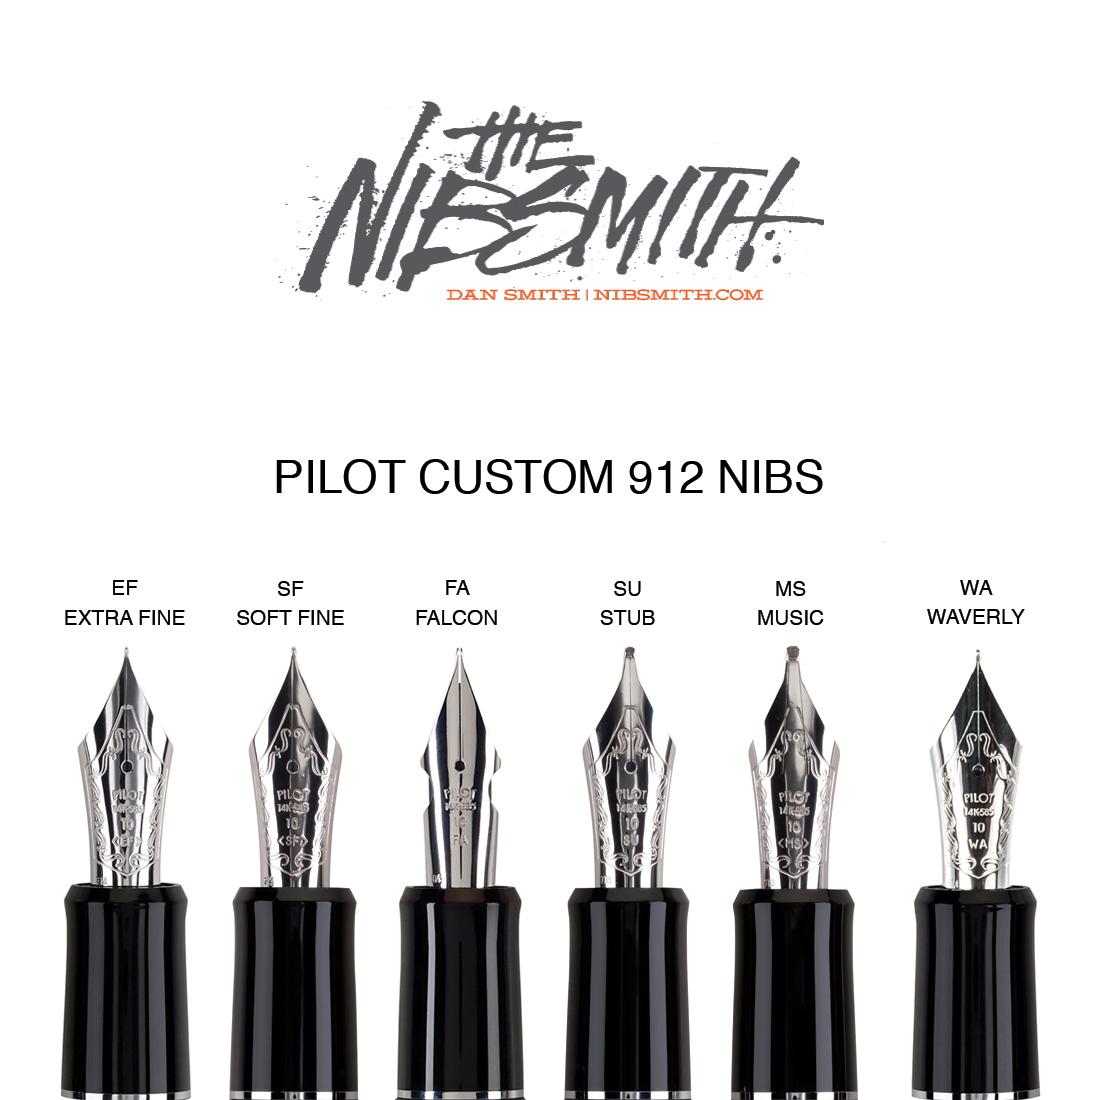 PILOT-912-NIBS